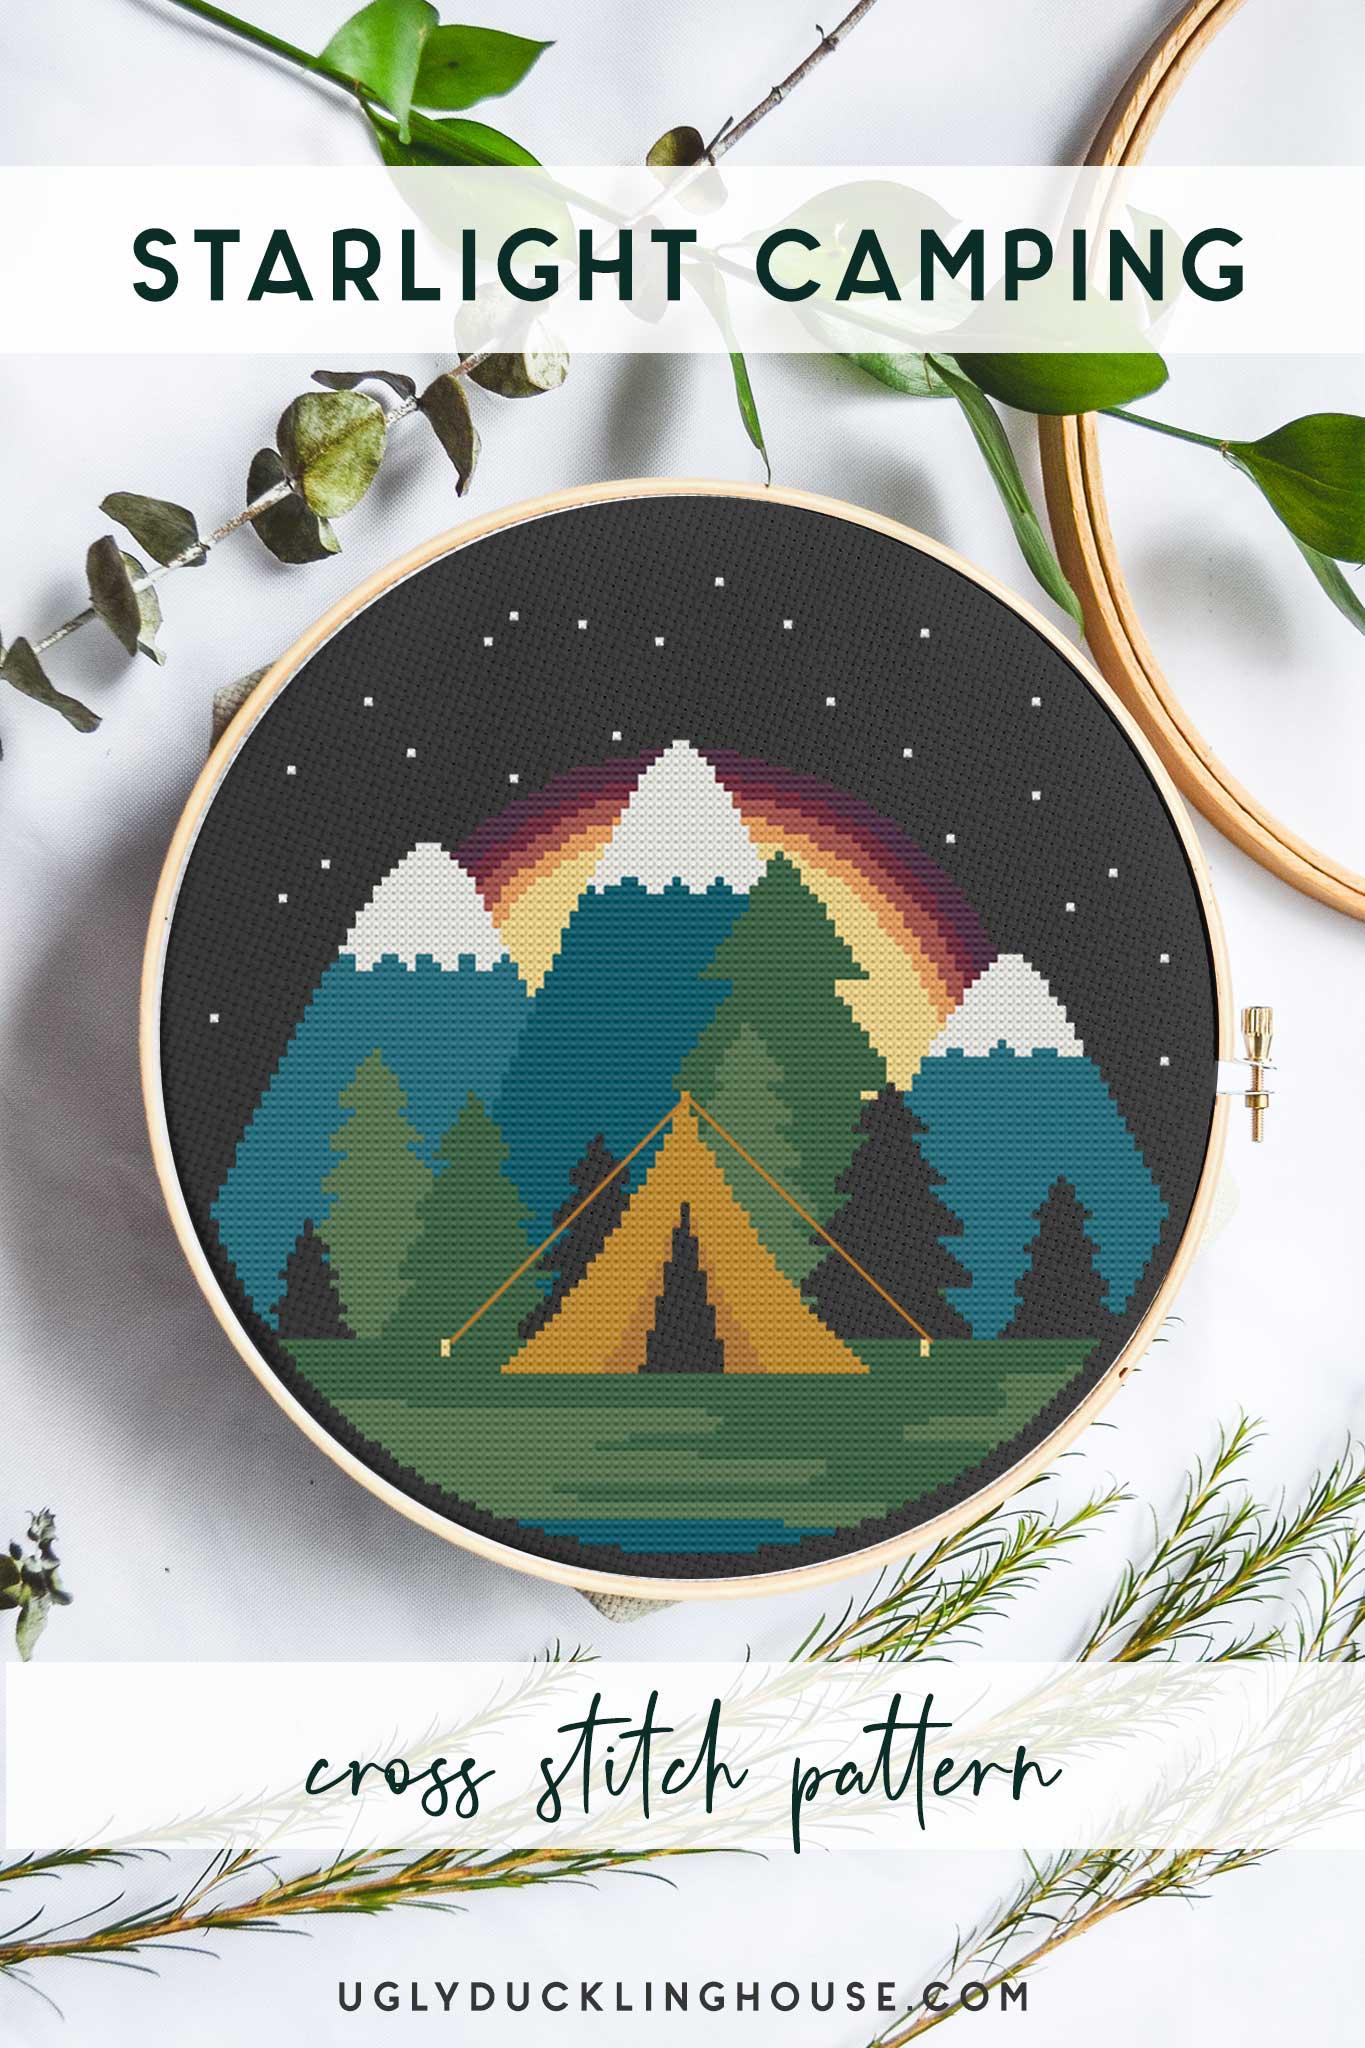 starlight camping cross stitch with dark background nighttime camping scene